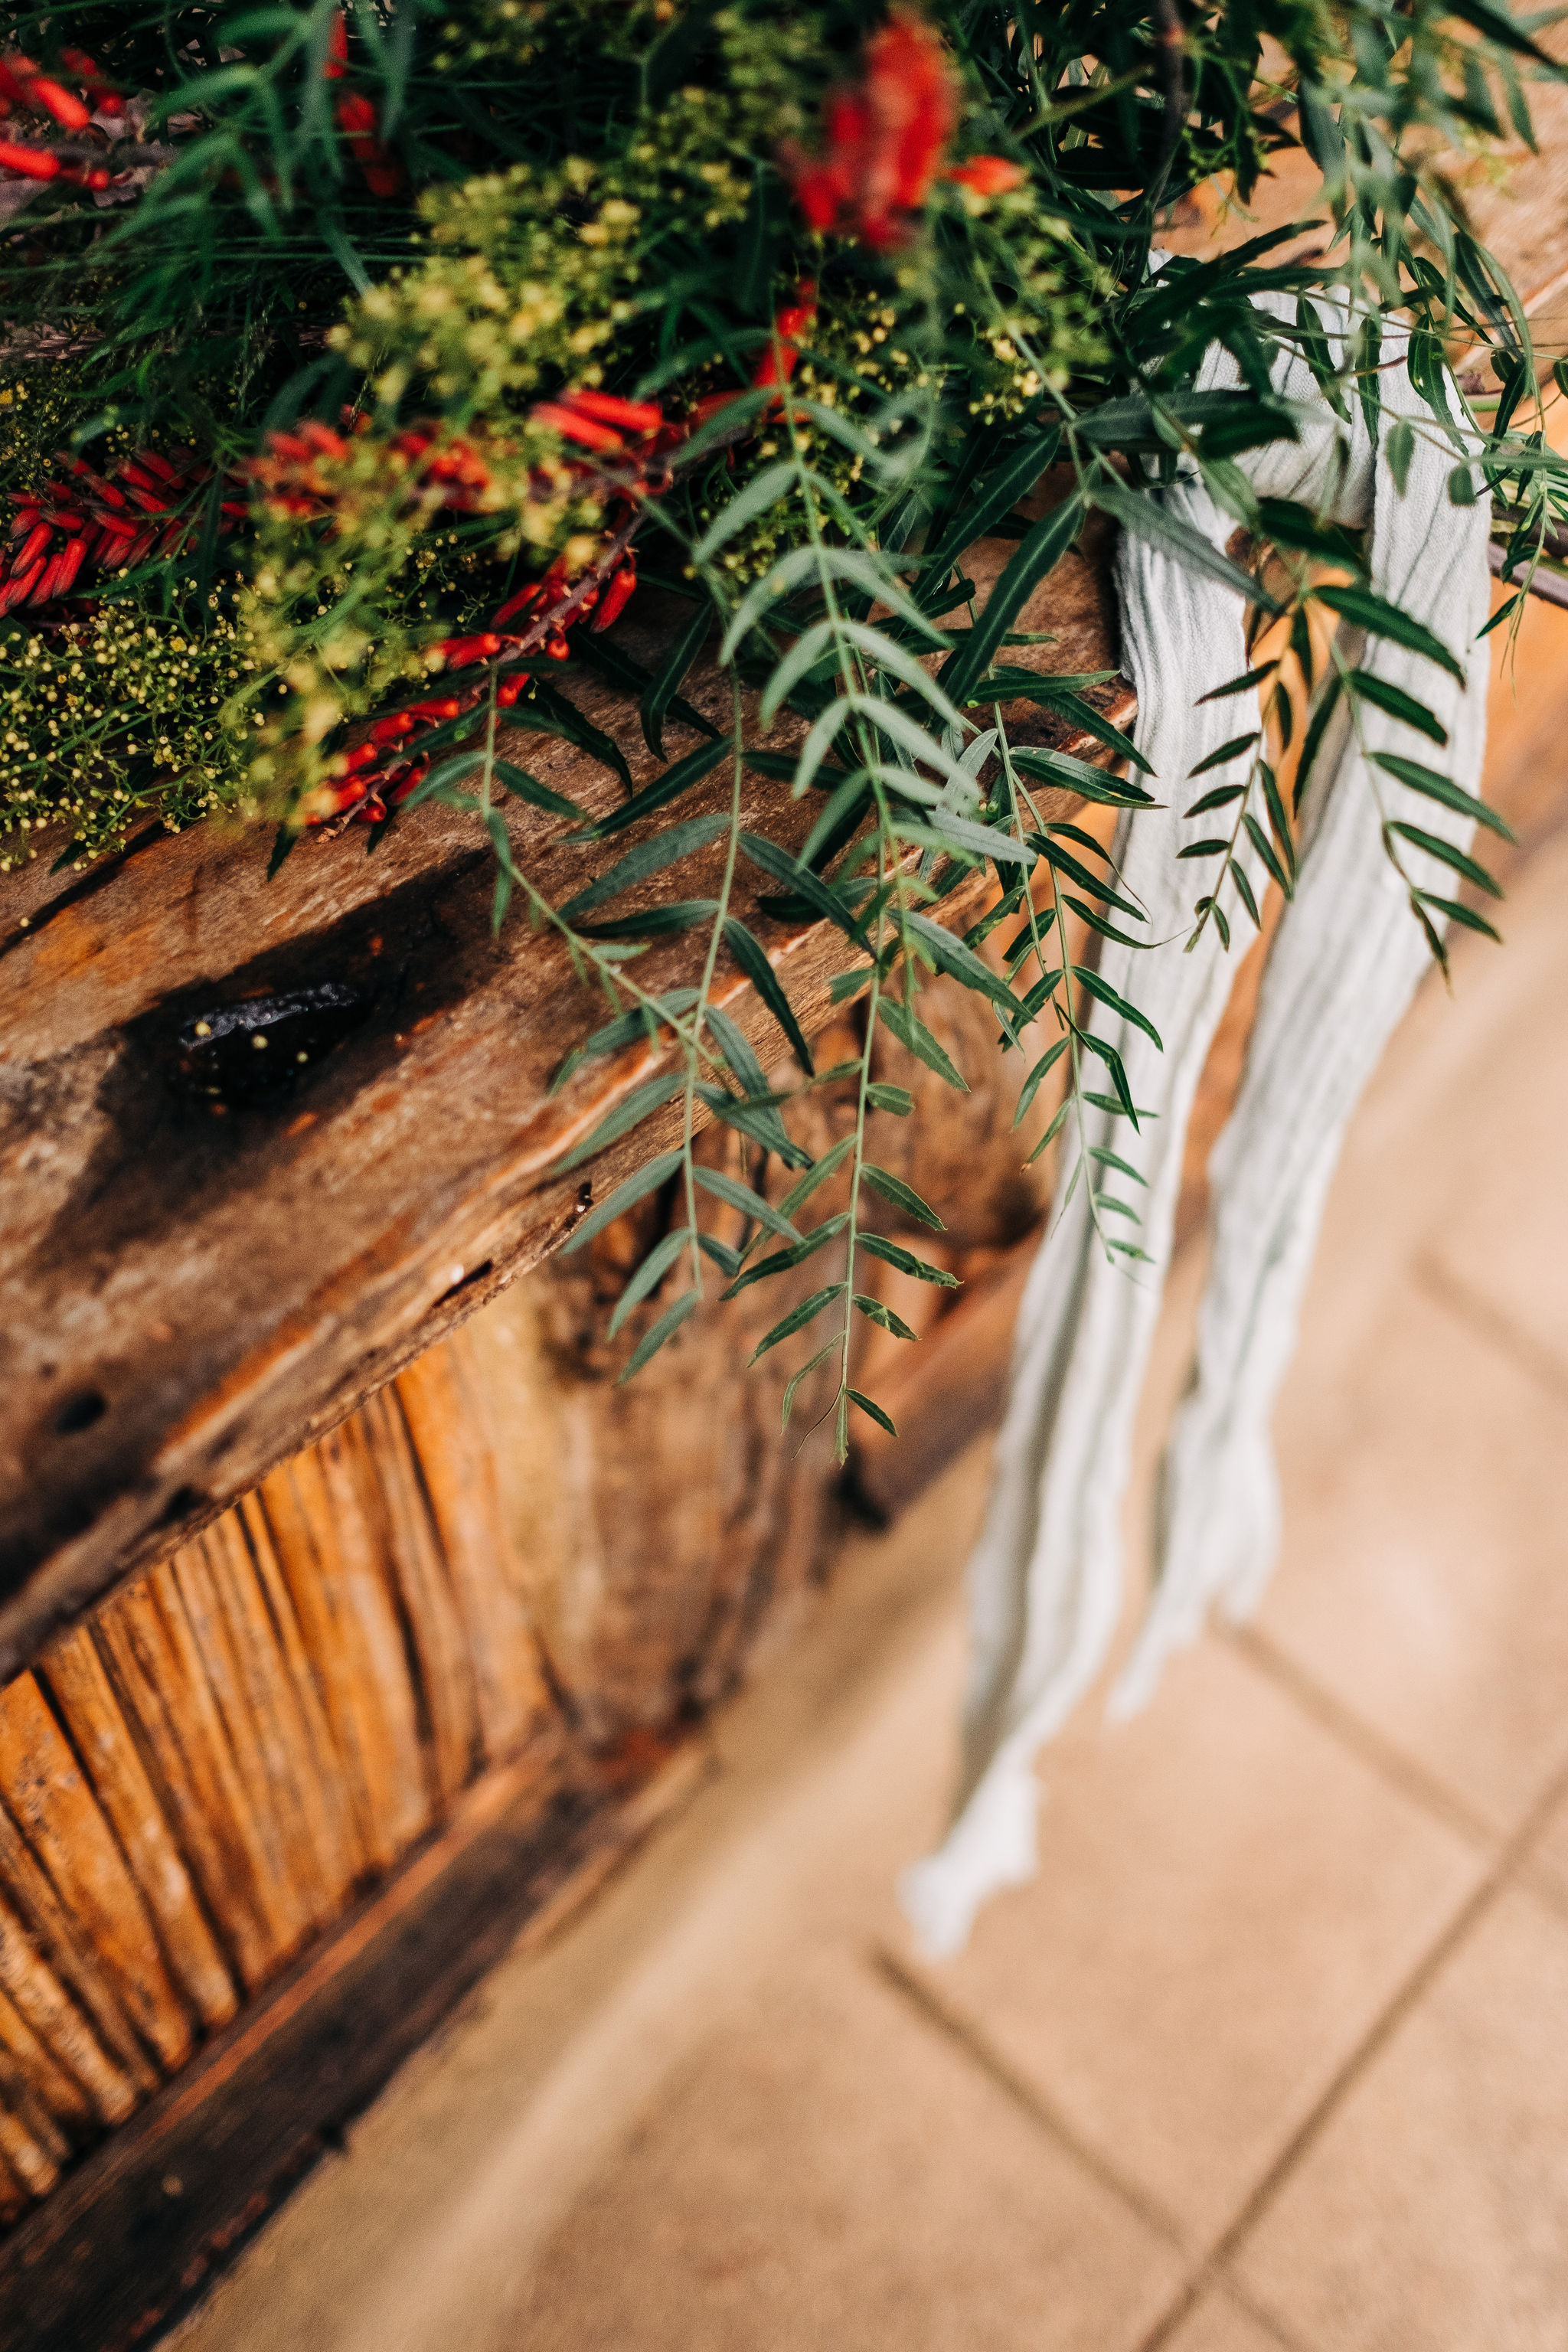 Anna-Hari-Photography-Destination-Wedding-Photographer-Kenya-12.jpg